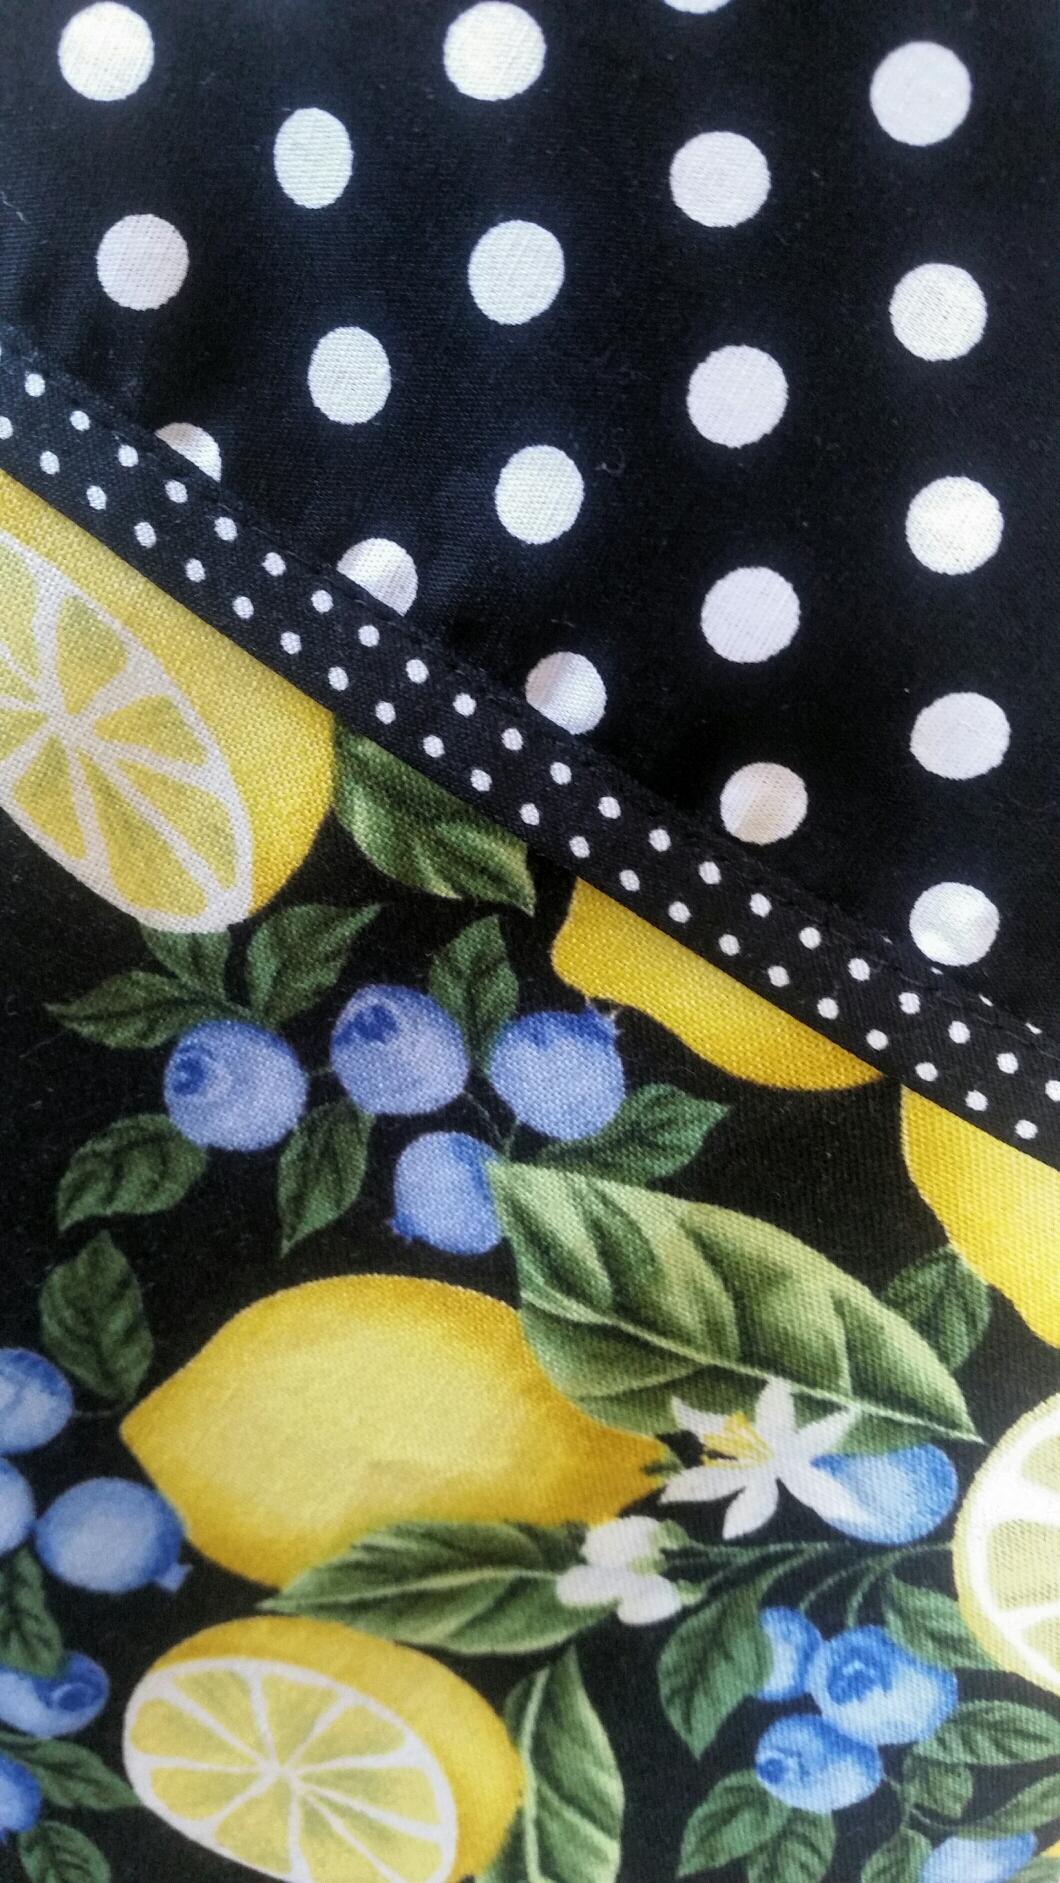 Buy white apron nz - Lemon And Blueberry Apron Black White Blue Yellow Apron Black White Spot Full Apron